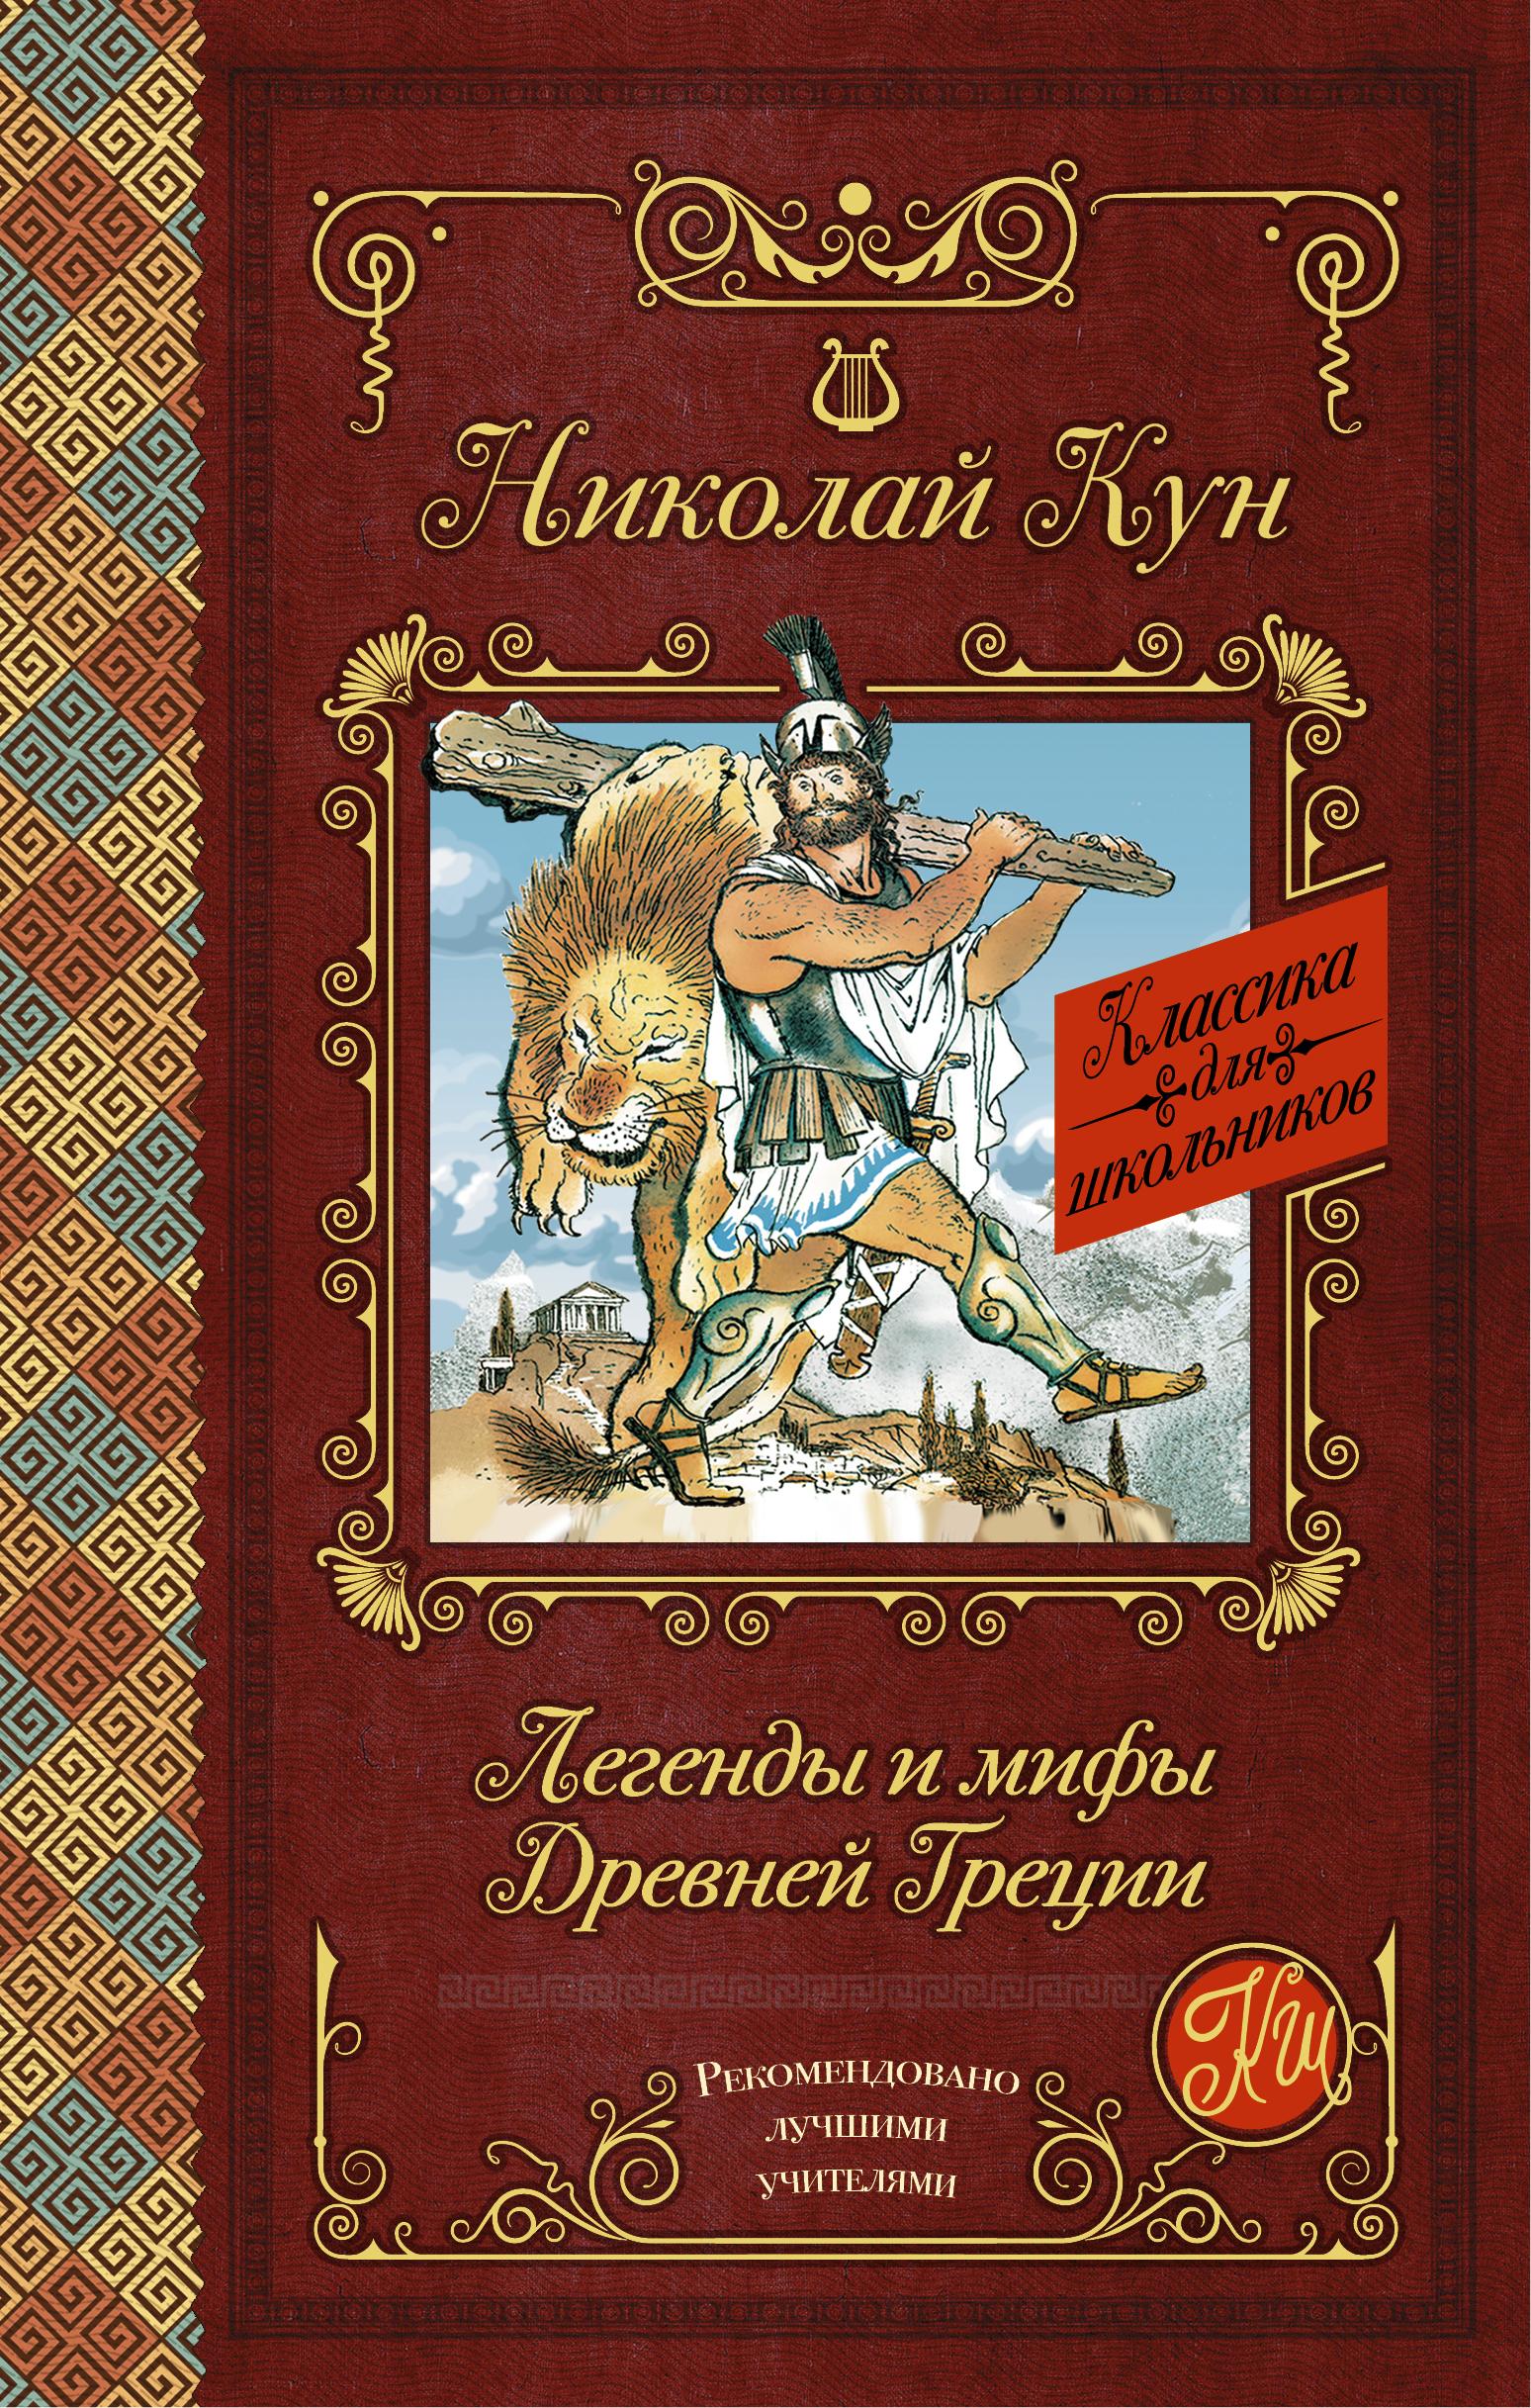 Кун Н.А. Легенды и мифы Древней Греции эксмо мифы древней греции